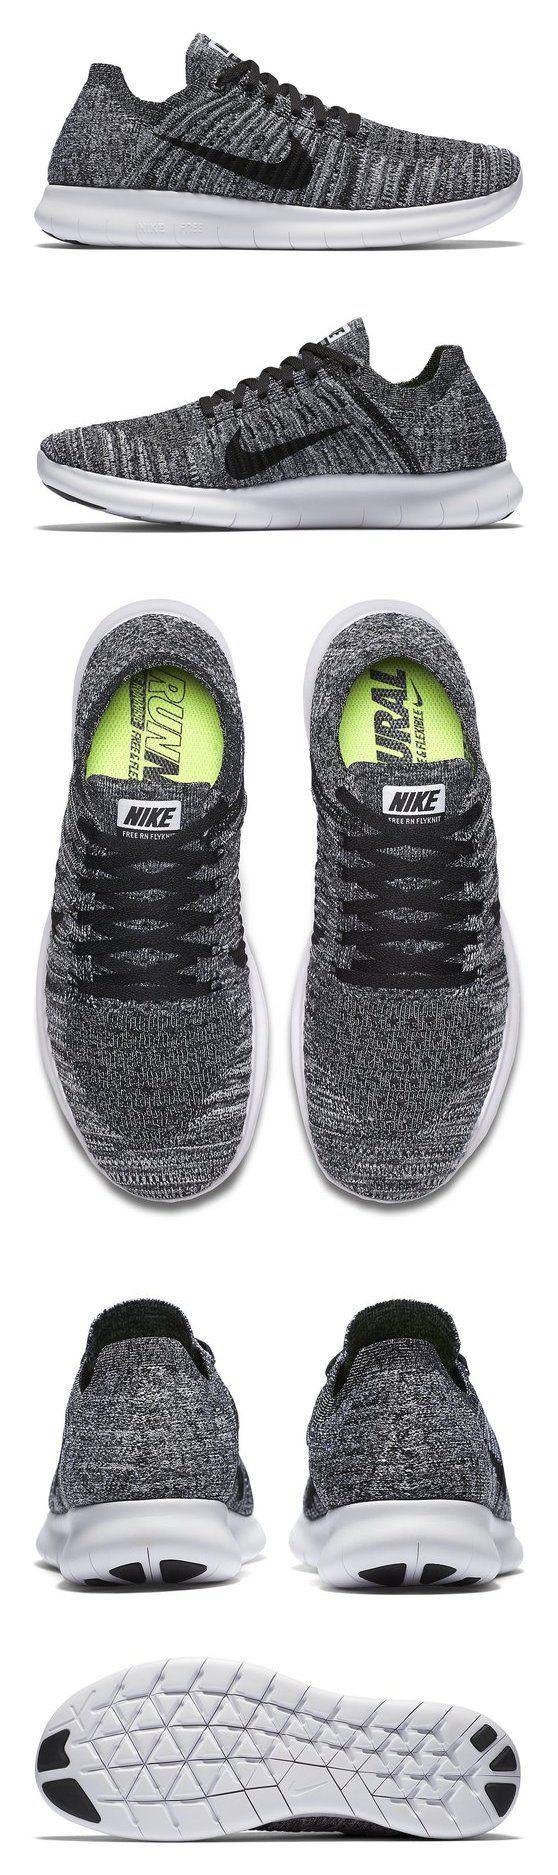 $130 - Nike Women's Free Rn Flyknit Running Shoe White/Black 9 B(M) US #shoes #n...